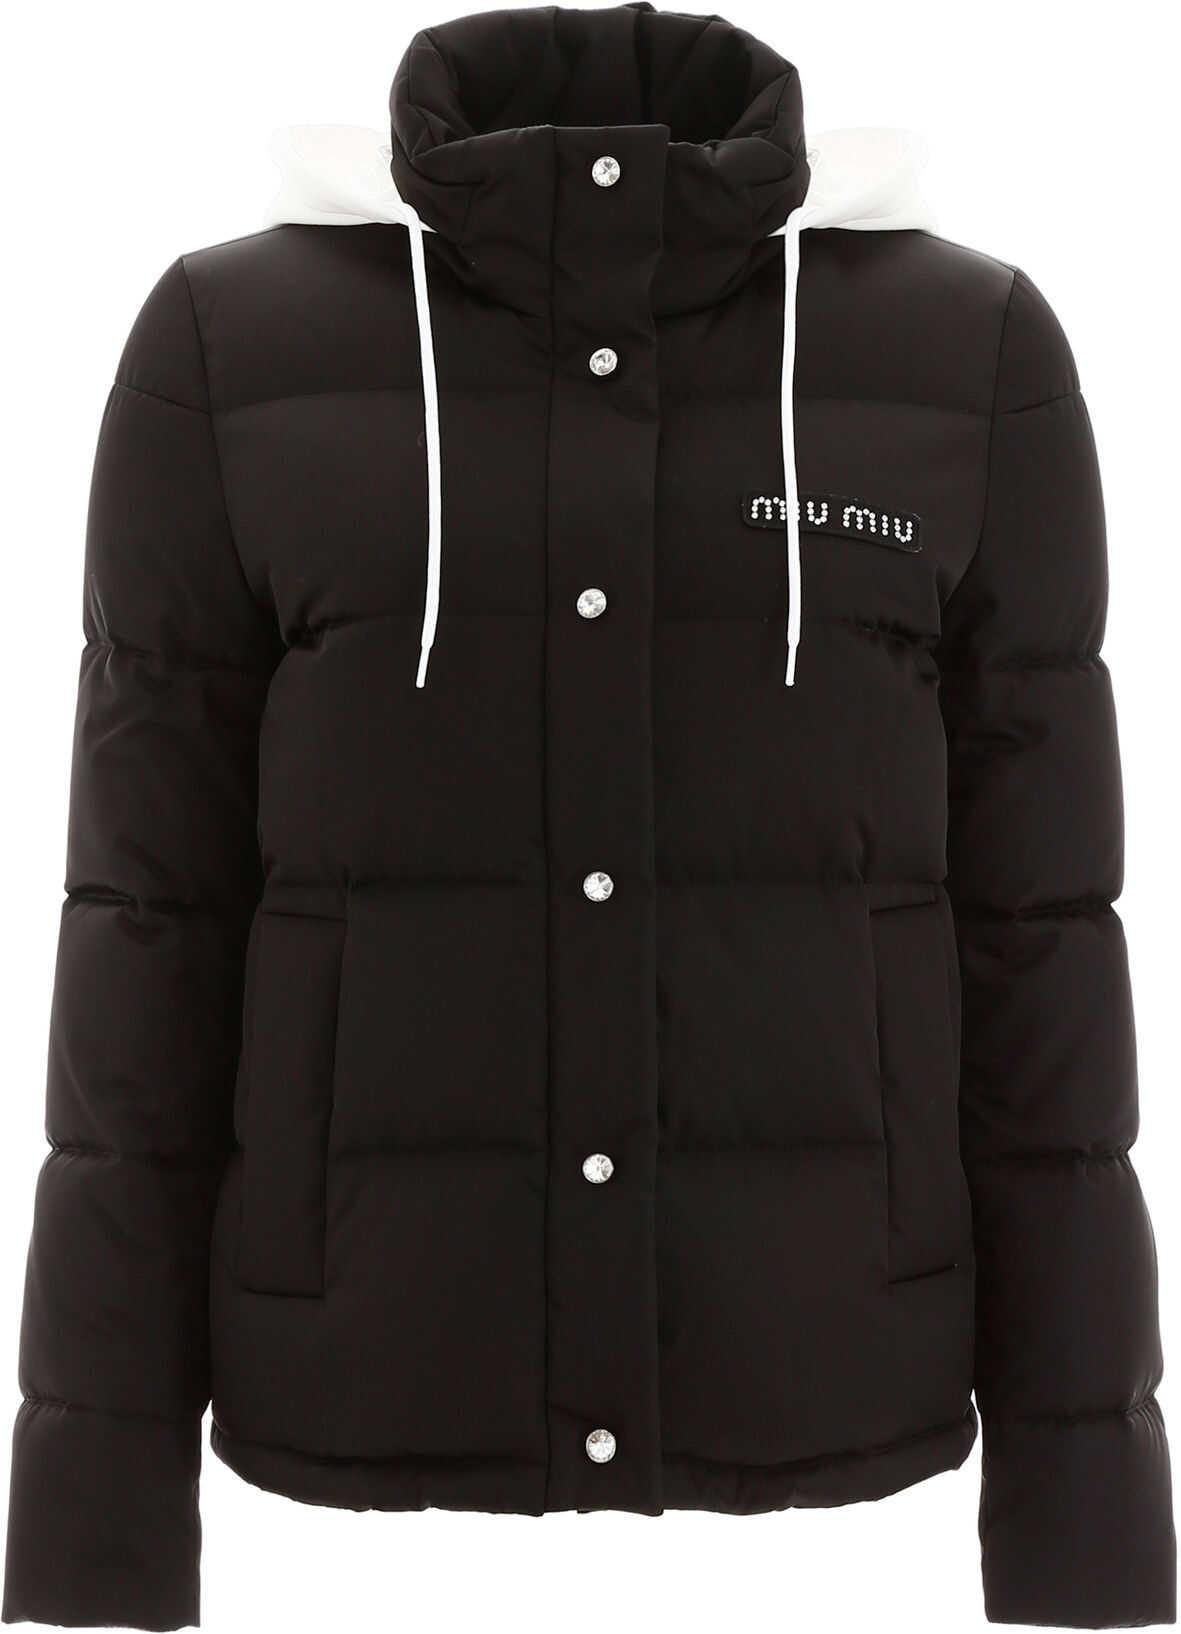 Miu Miu Logo Puffer Jacket With Crystals NERO